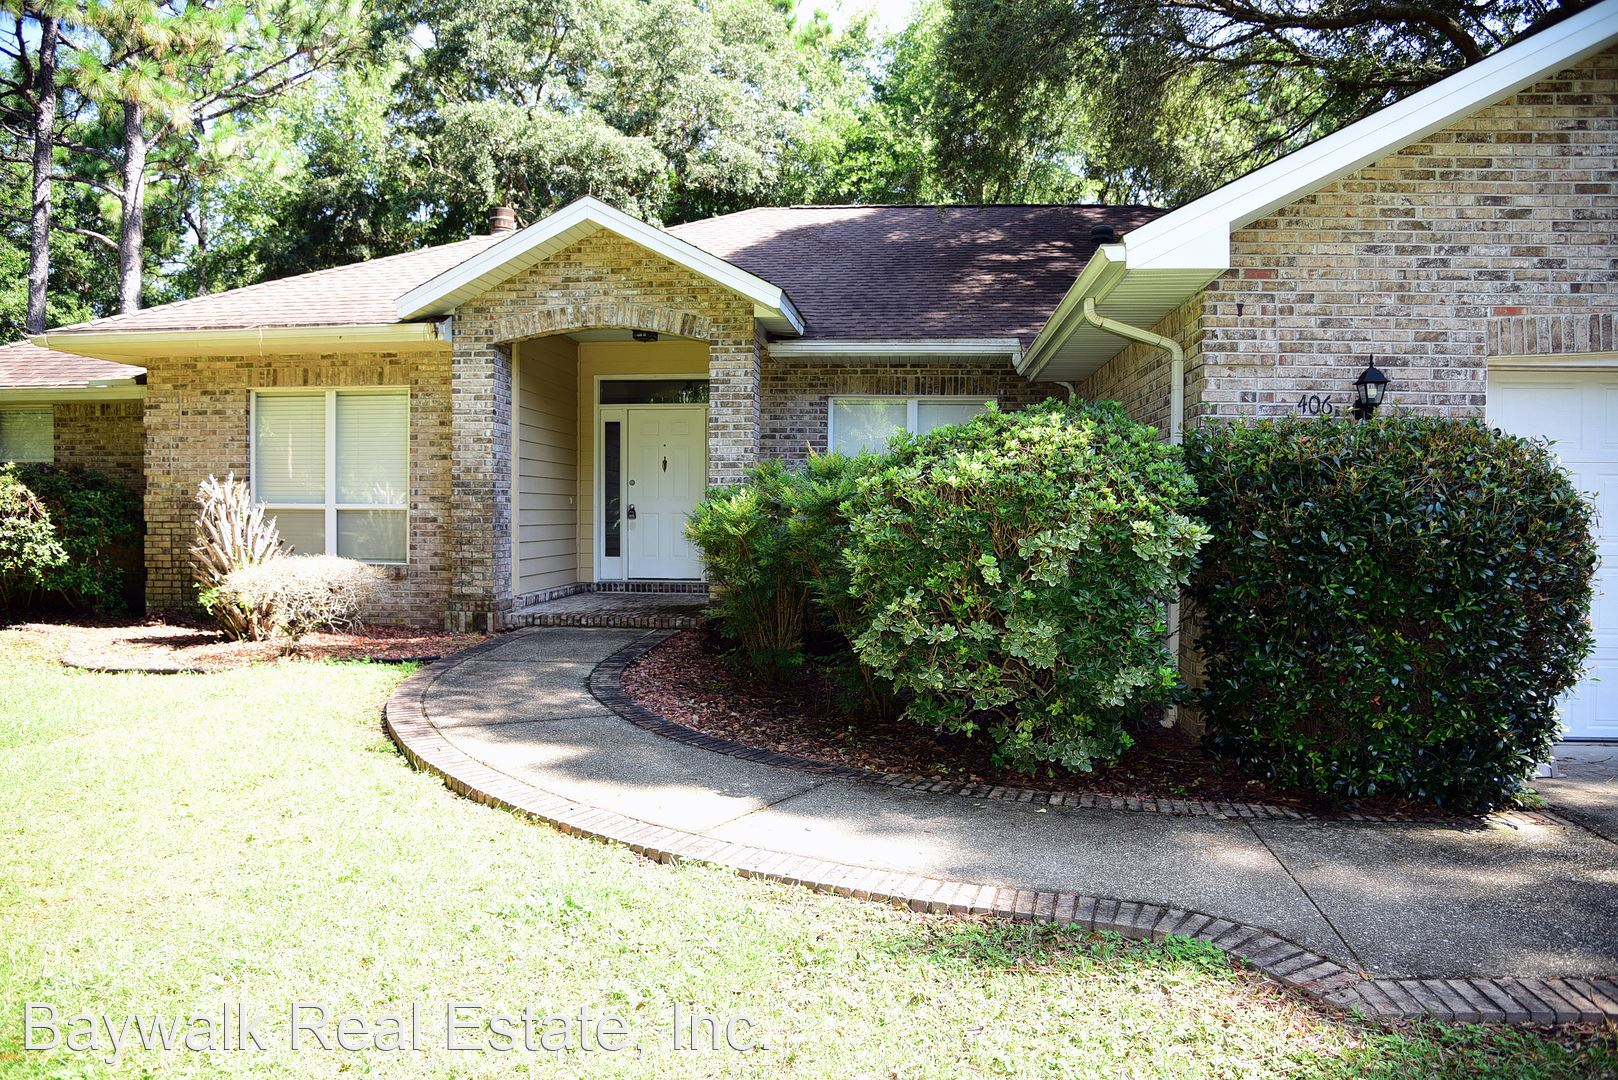 406 Bally Way, Niceville, FL - $2,400